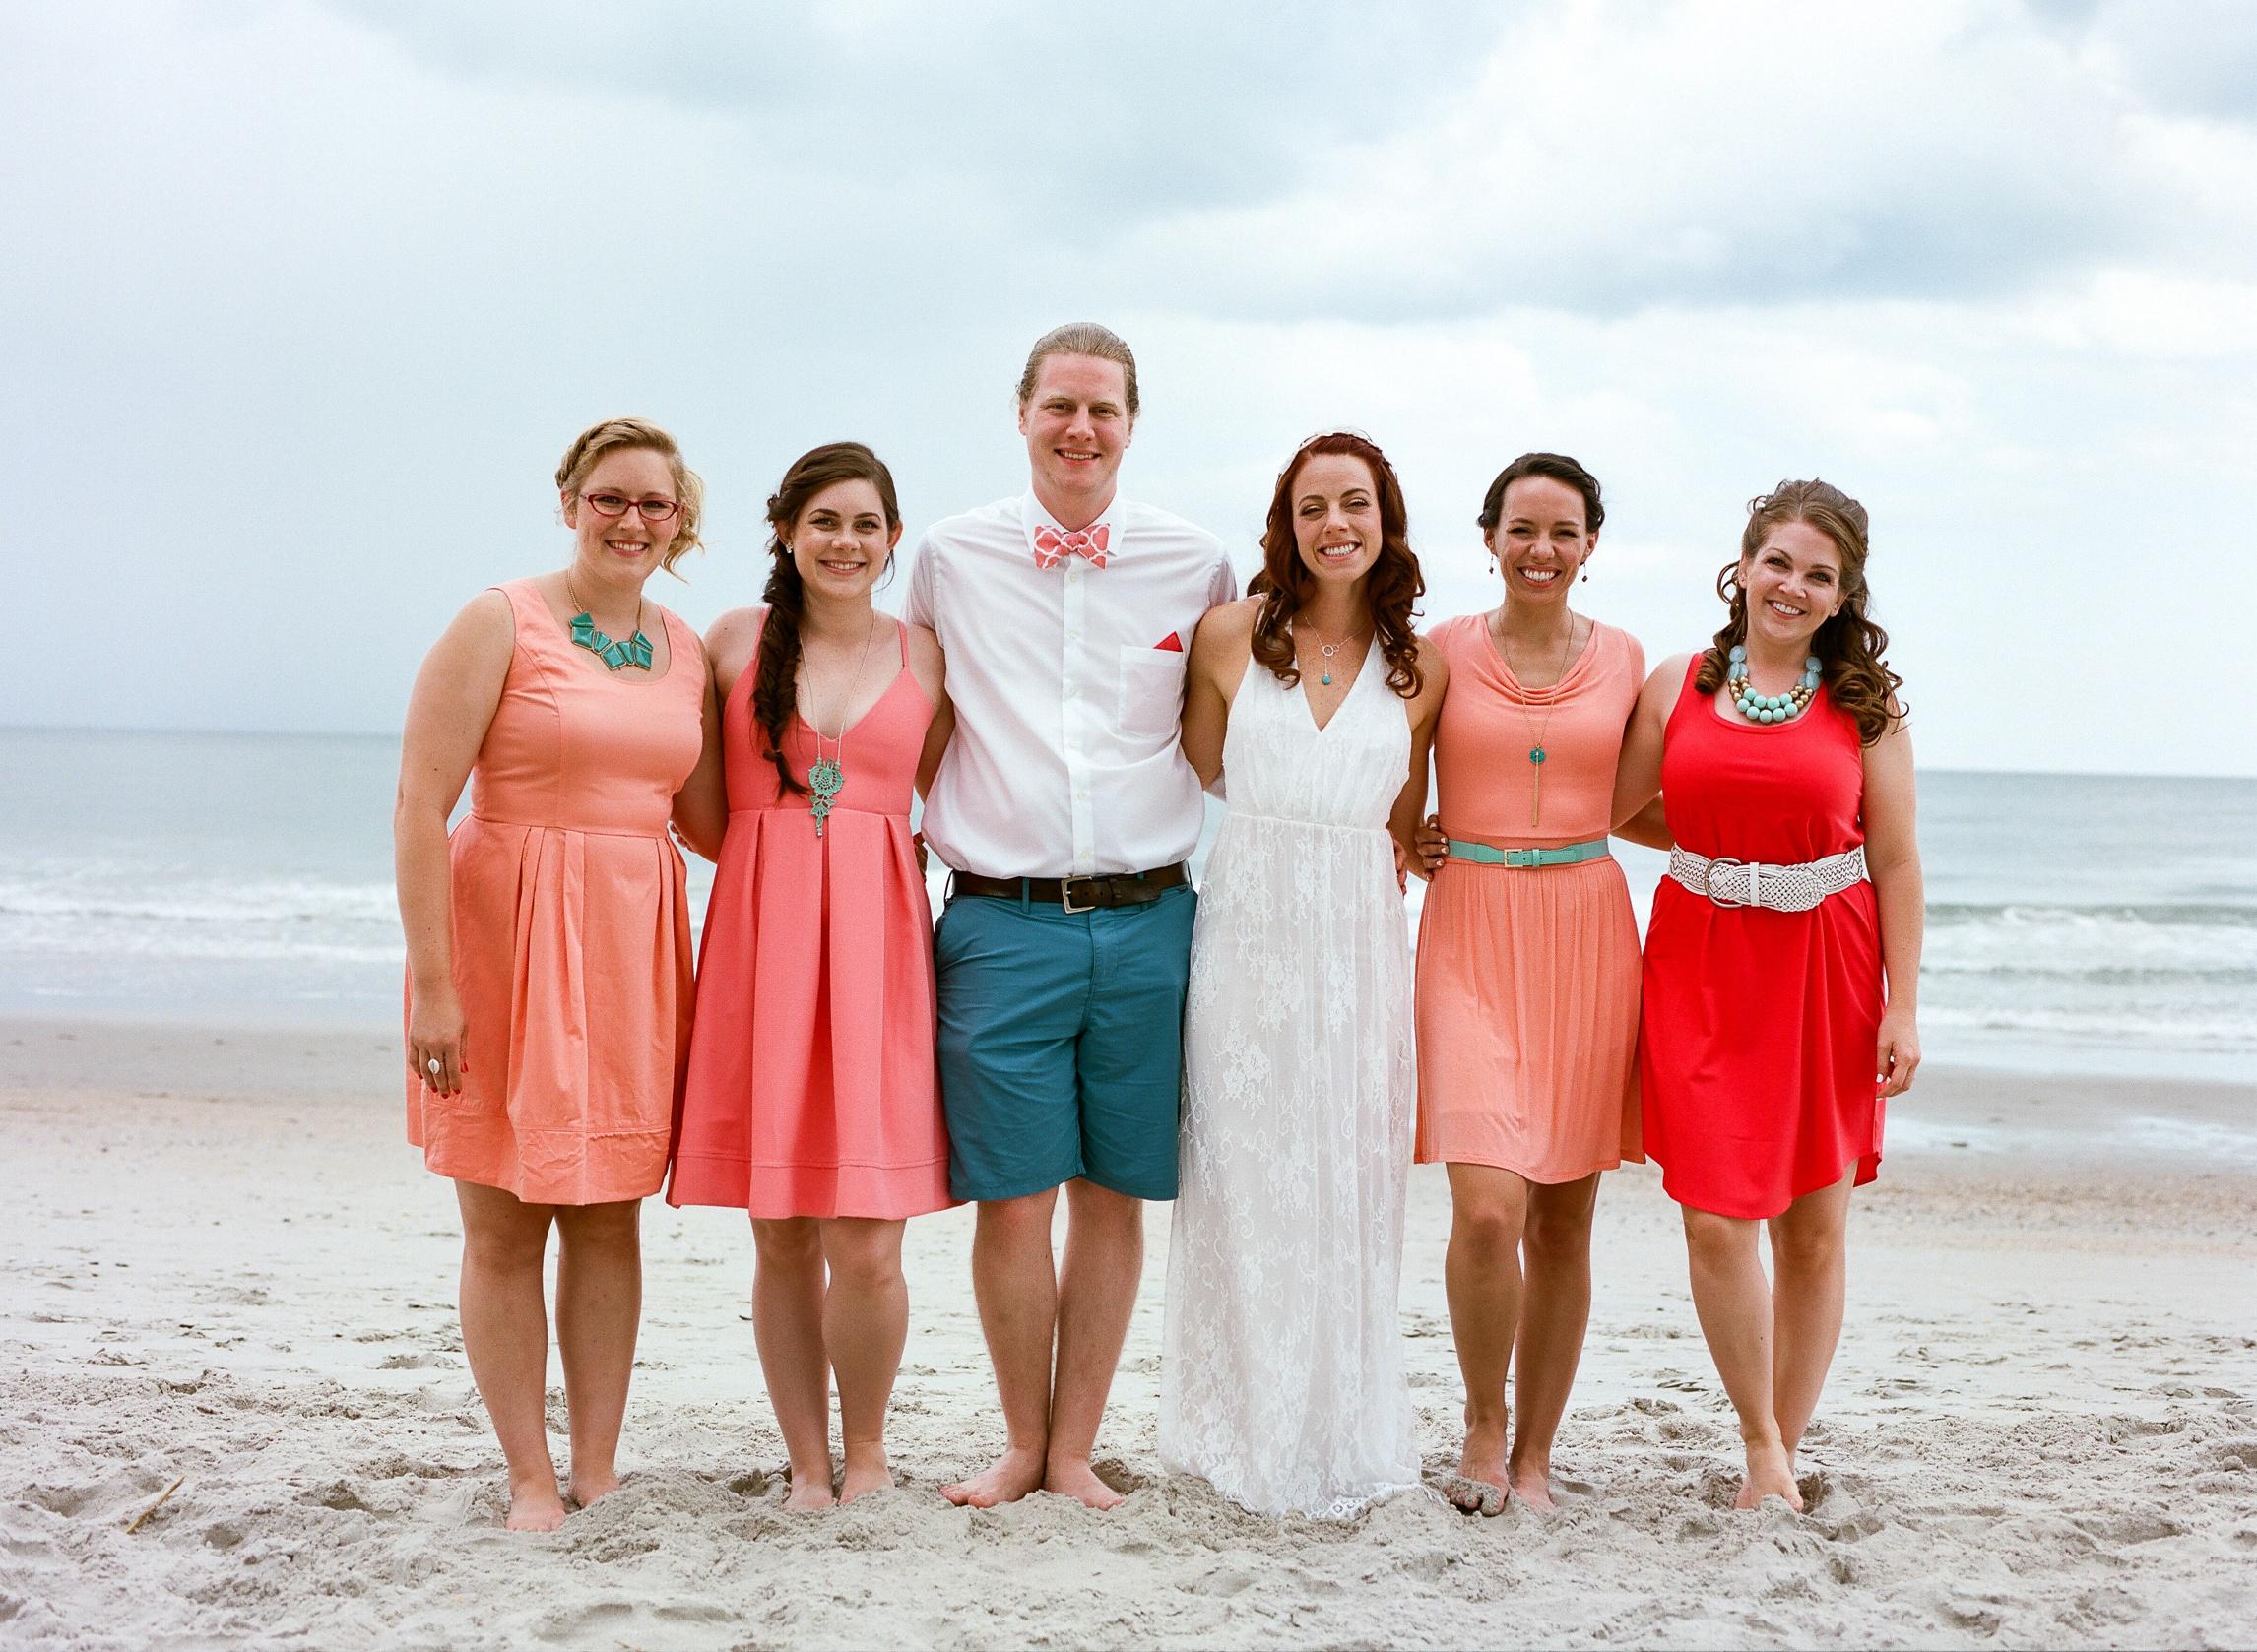 coral-dress-bridesmaids-atlantic-ocean-brother-myrtle-beach-south-carolina-Sonja-k-photography-sonjakphotography-honest-film-is-not-dead-best-fort-collins-northern-colorado-piedmont-good-creative-front-range-wedding-photographer-salzburg-rocky-mountains-meet-the-plains-look-portraits-family-southern-travel-destination-wyoming-artistic-denver-boulder-natural-lgbtq-gay-new-orleans-berlin-california-oakland-bride-groom-couple-outdoor-loveland-windsor-mountain-national-park-longmont-berthoud-bridal-party